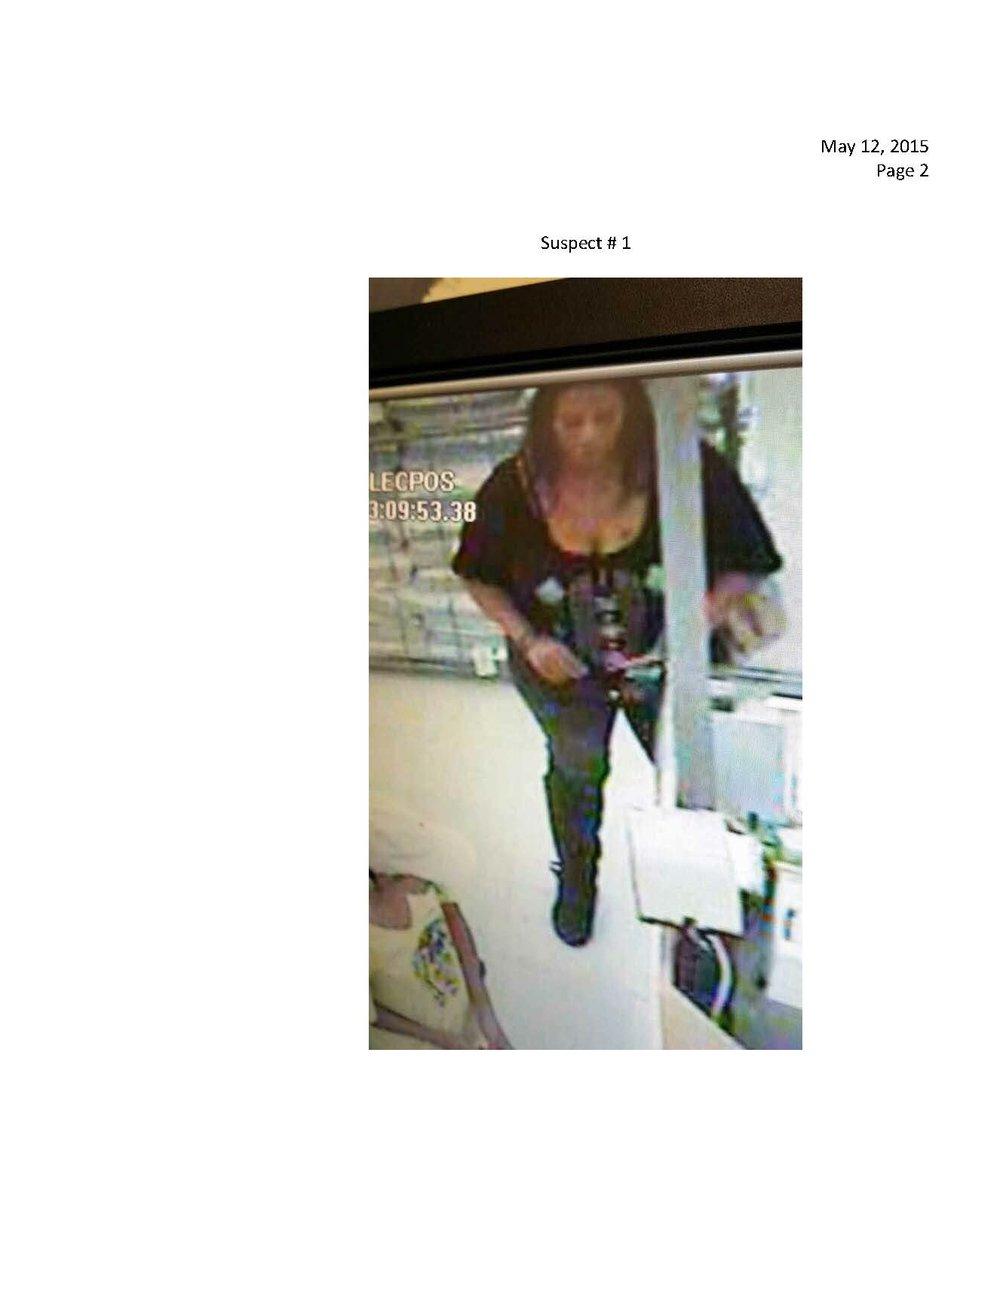 051215 Linda Vista Area Residential Burglary_Page_2